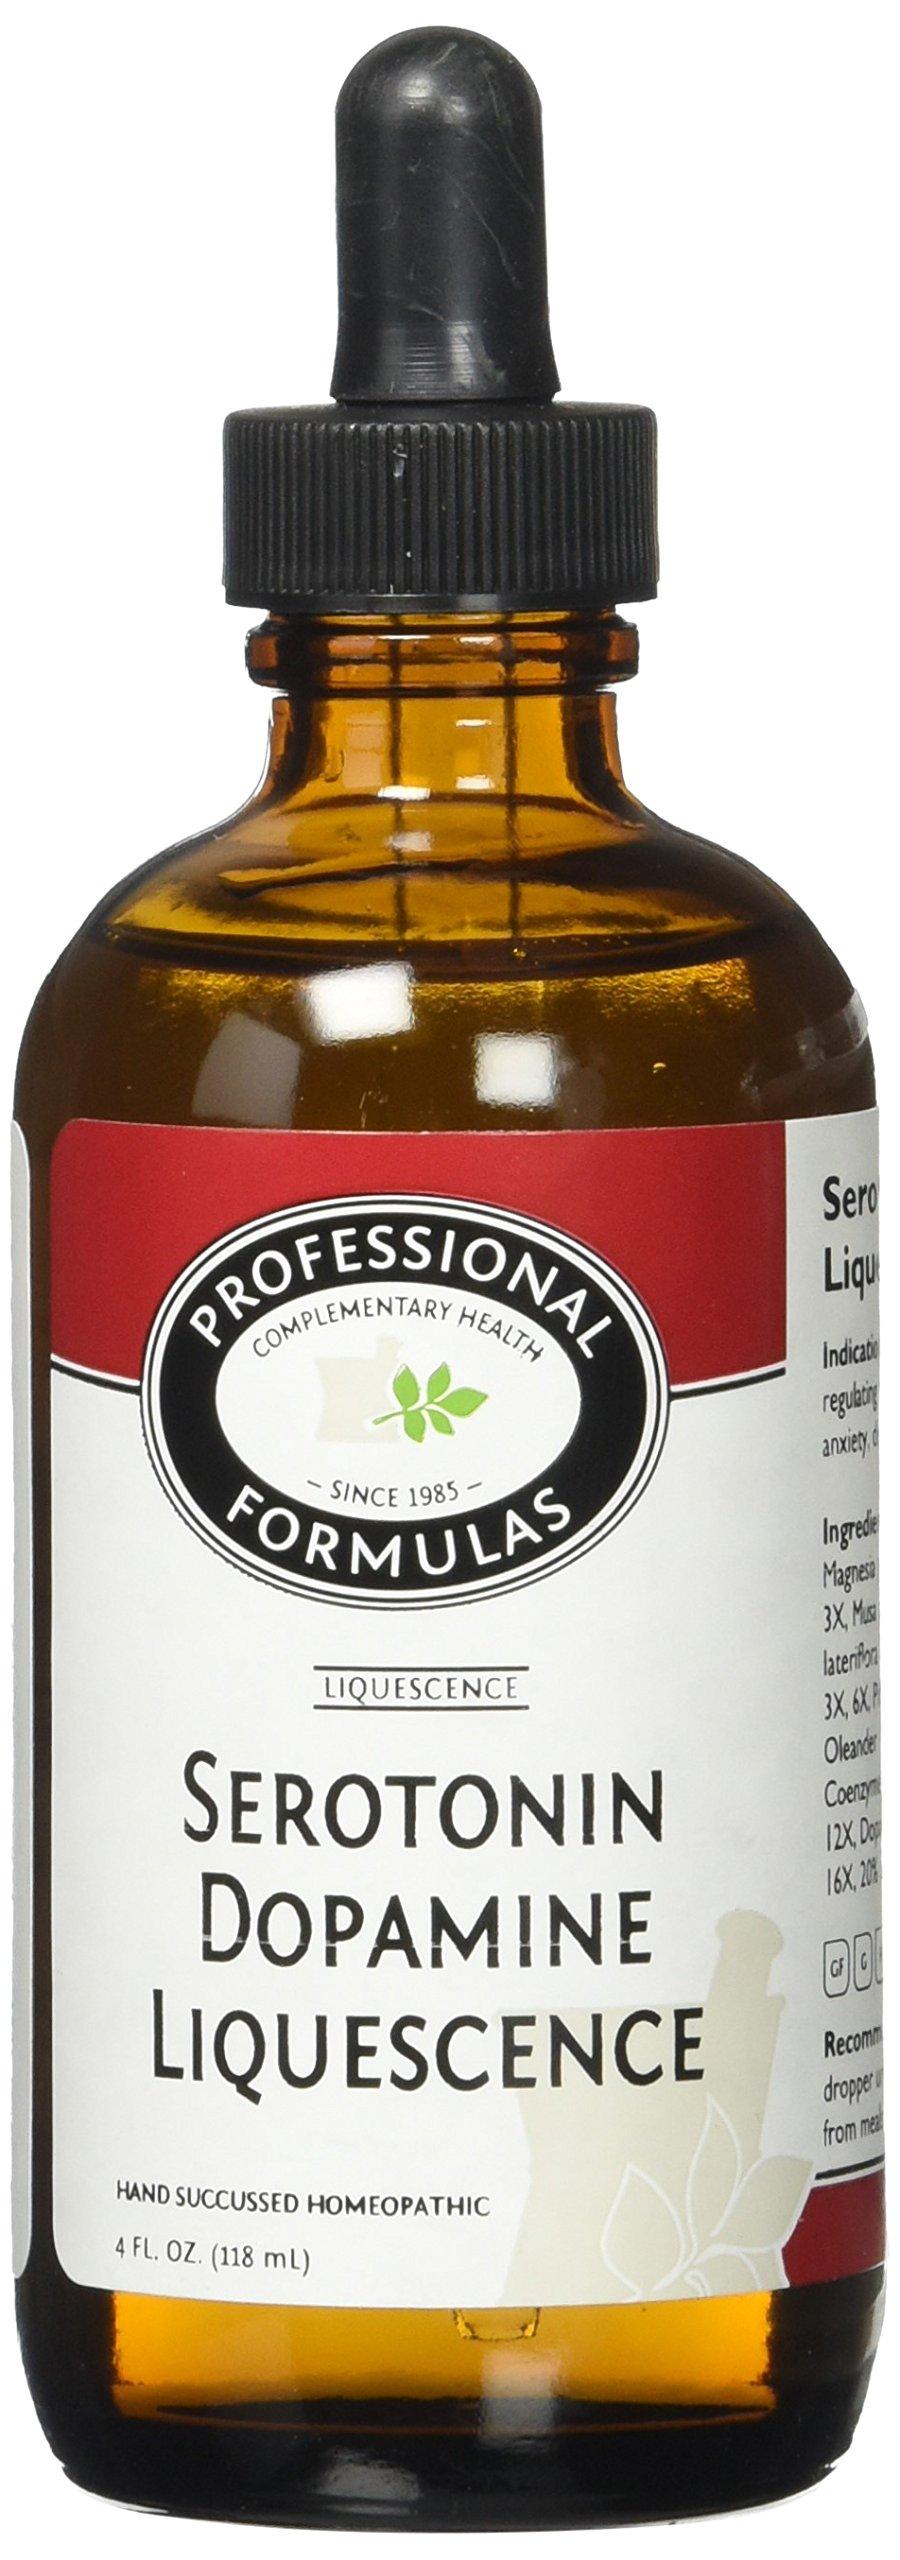 Serotonin Dopamine Liquescence 4oz by Professional Formulas